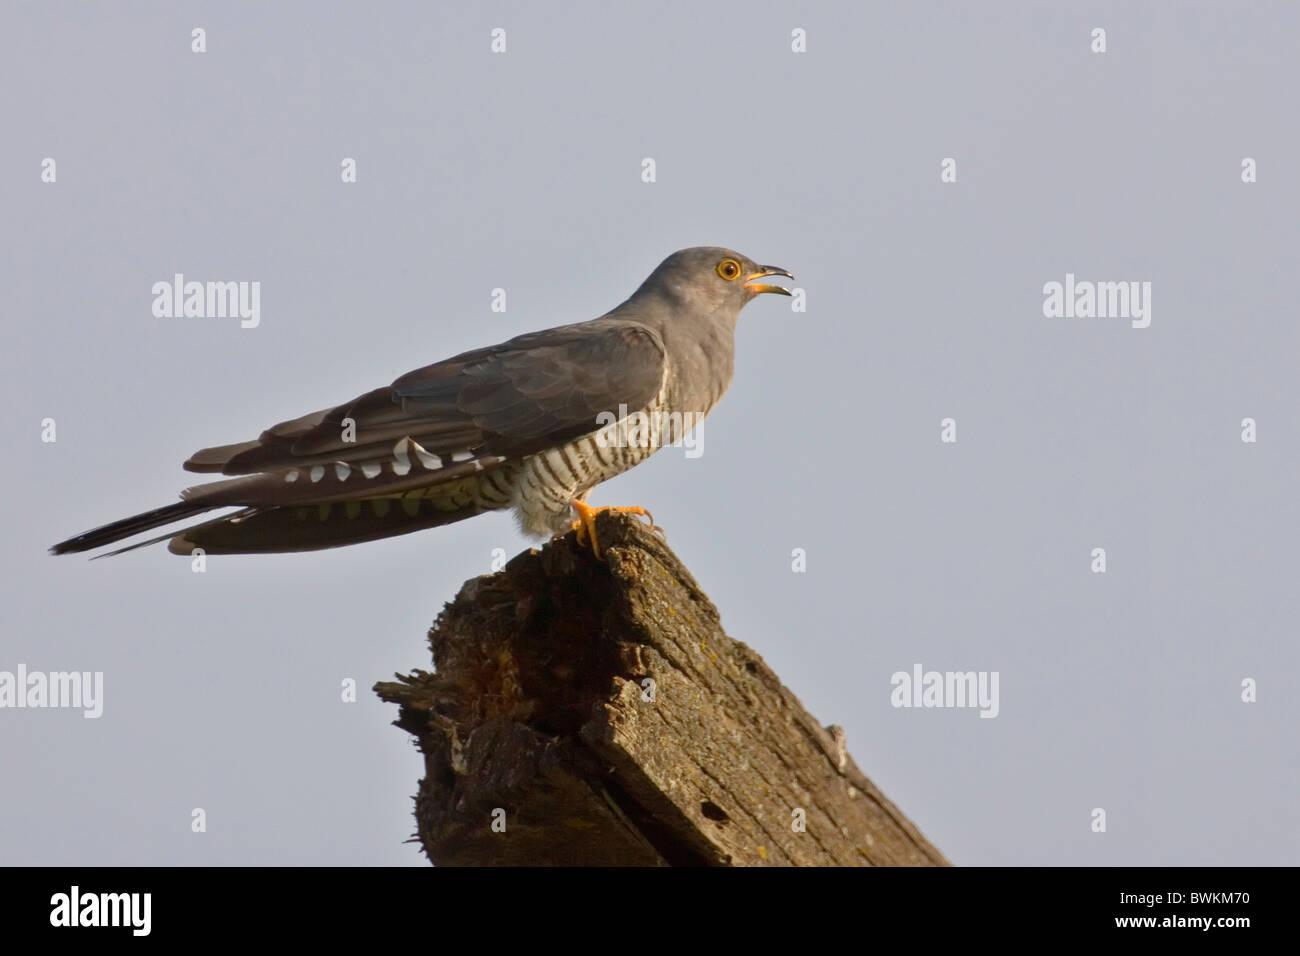 cuckoo - Stock Image